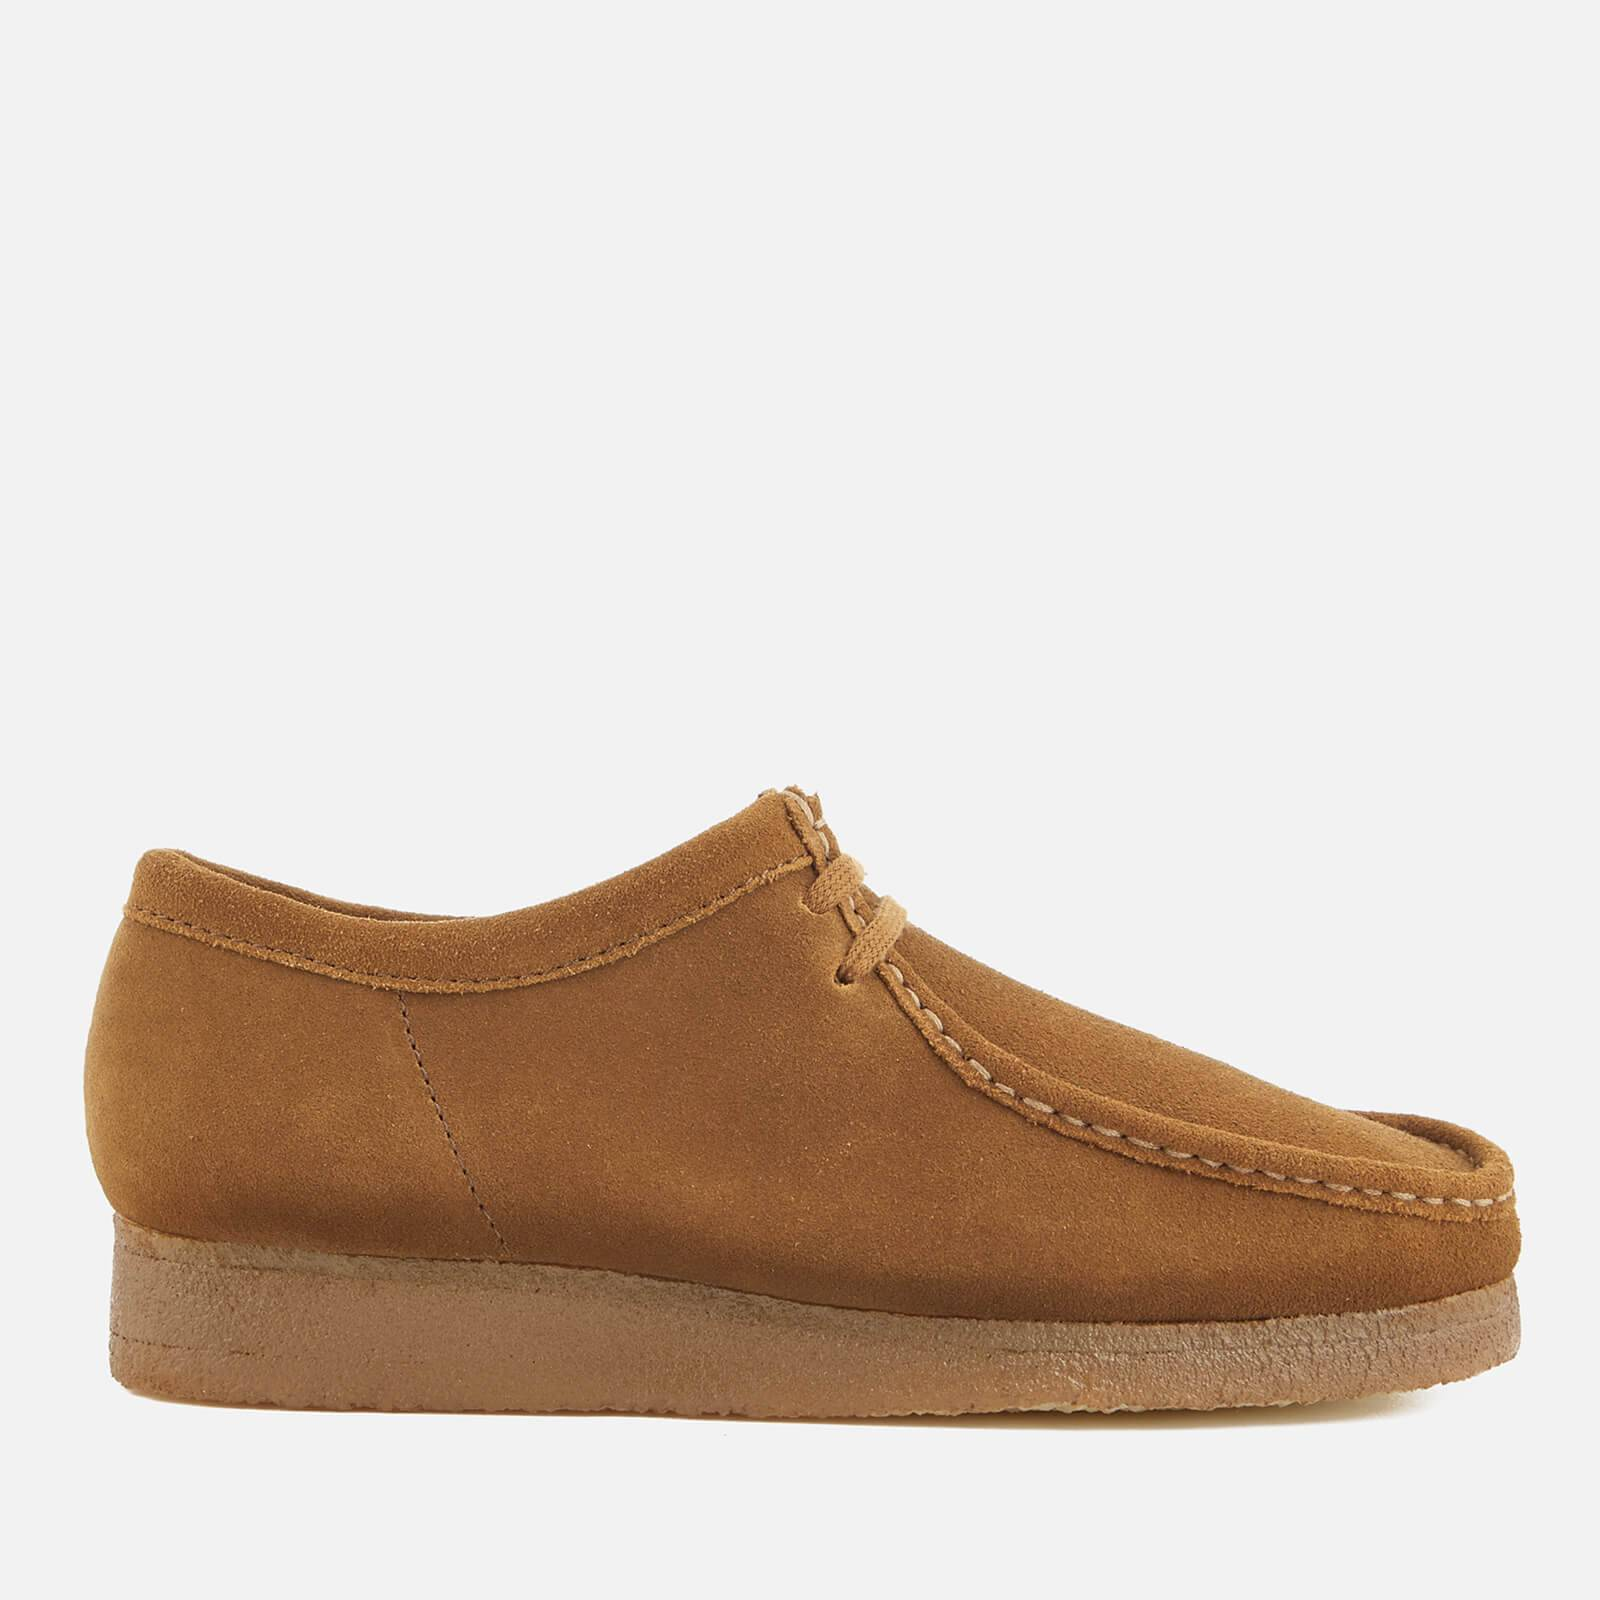 Clarks Originals Men's Wallabee Suede Shoes - Cola - UK 9 - Tan